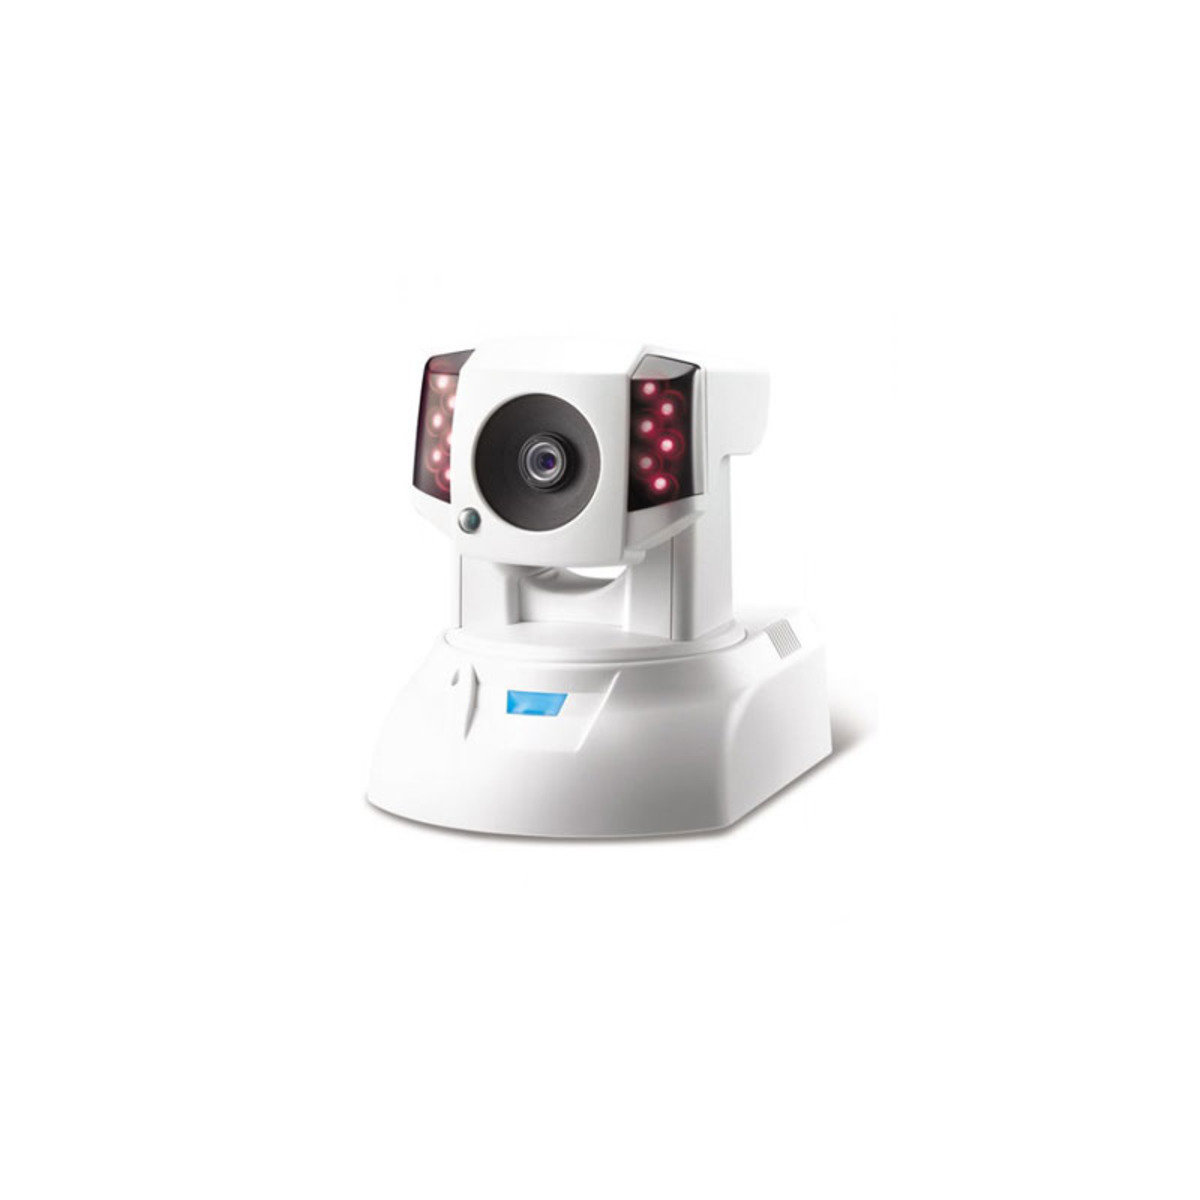 720p高清PTZ雲端網路攝影機連紅外線遙控 TN900RW